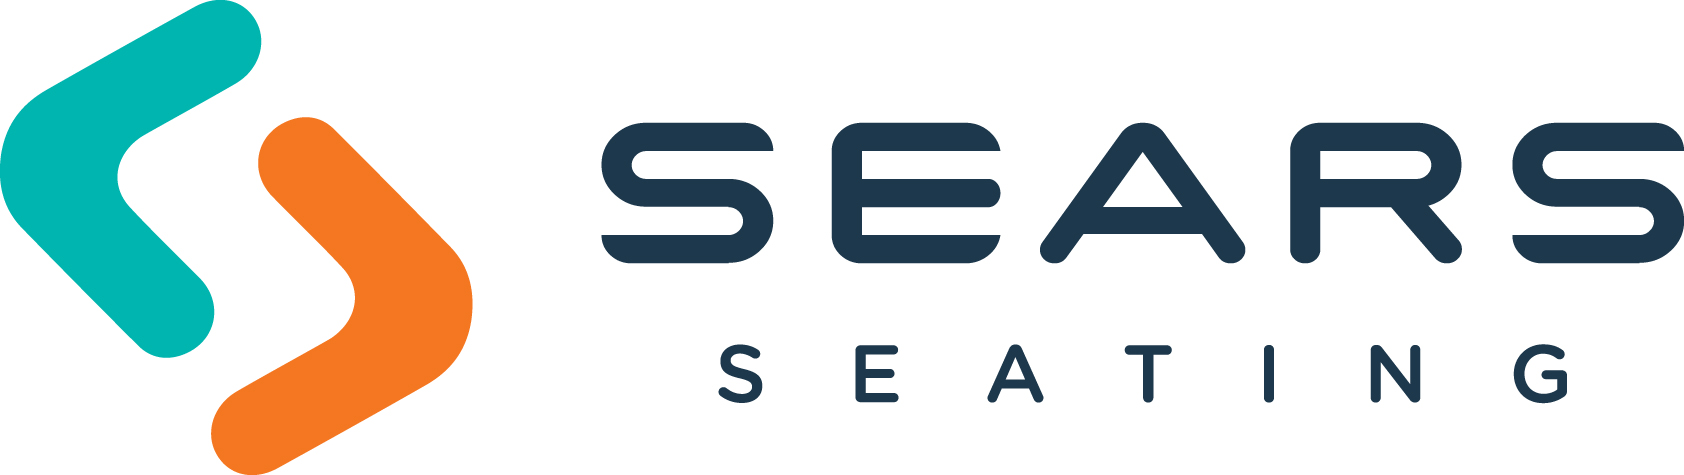 Sears Seating Logo